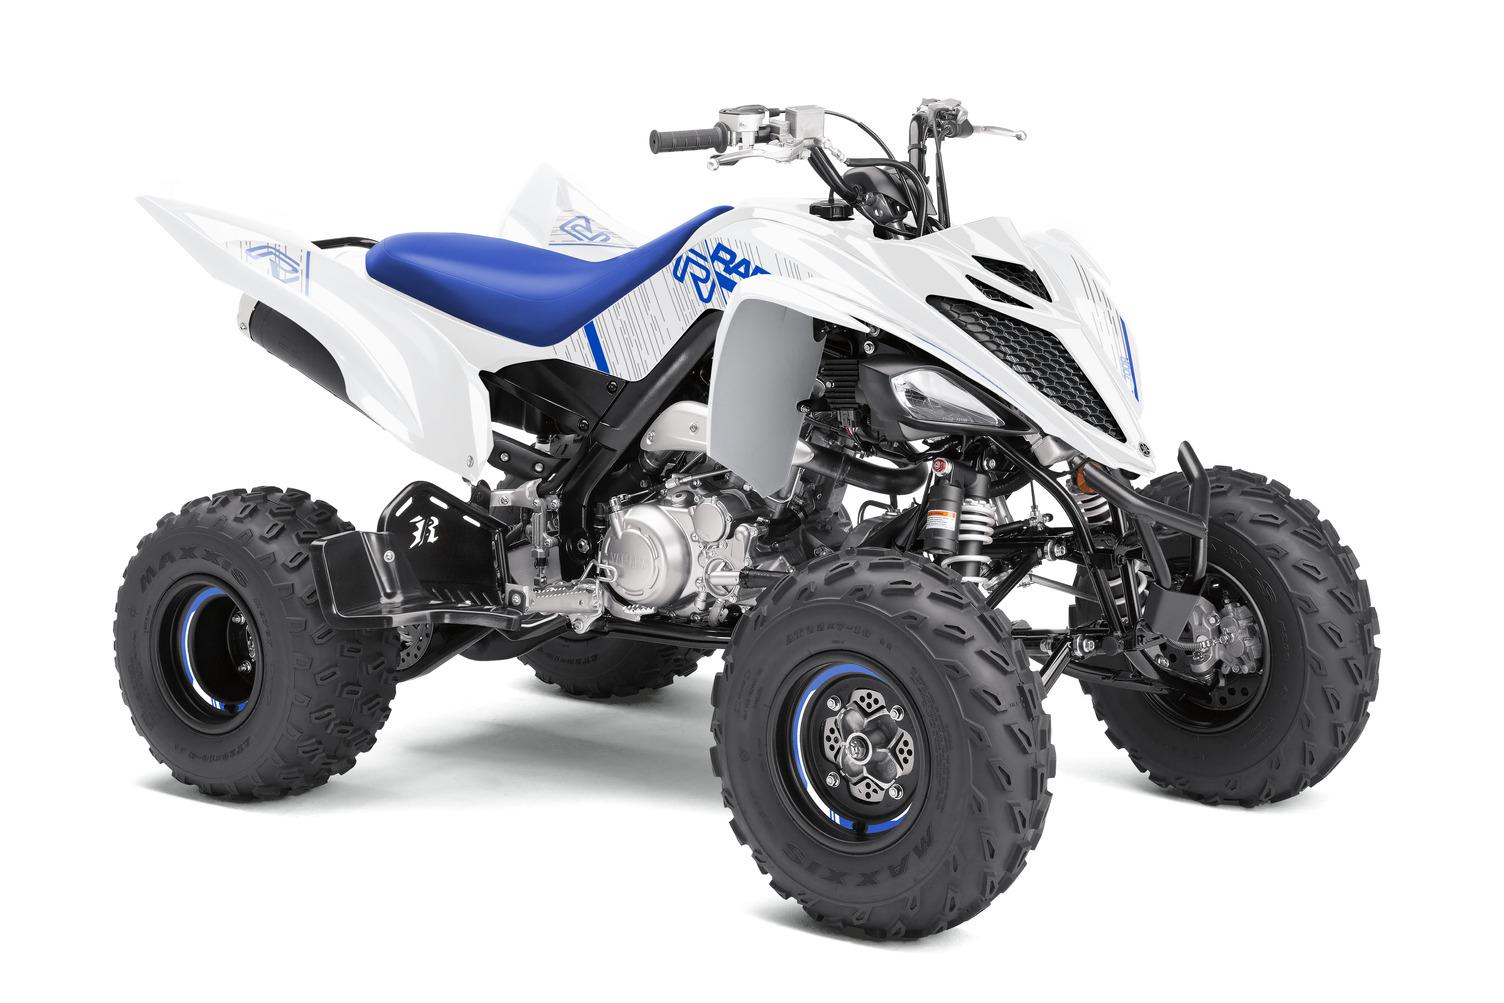 2021 Yamaha Raptor 700R SE in White Team Yamaha Blue